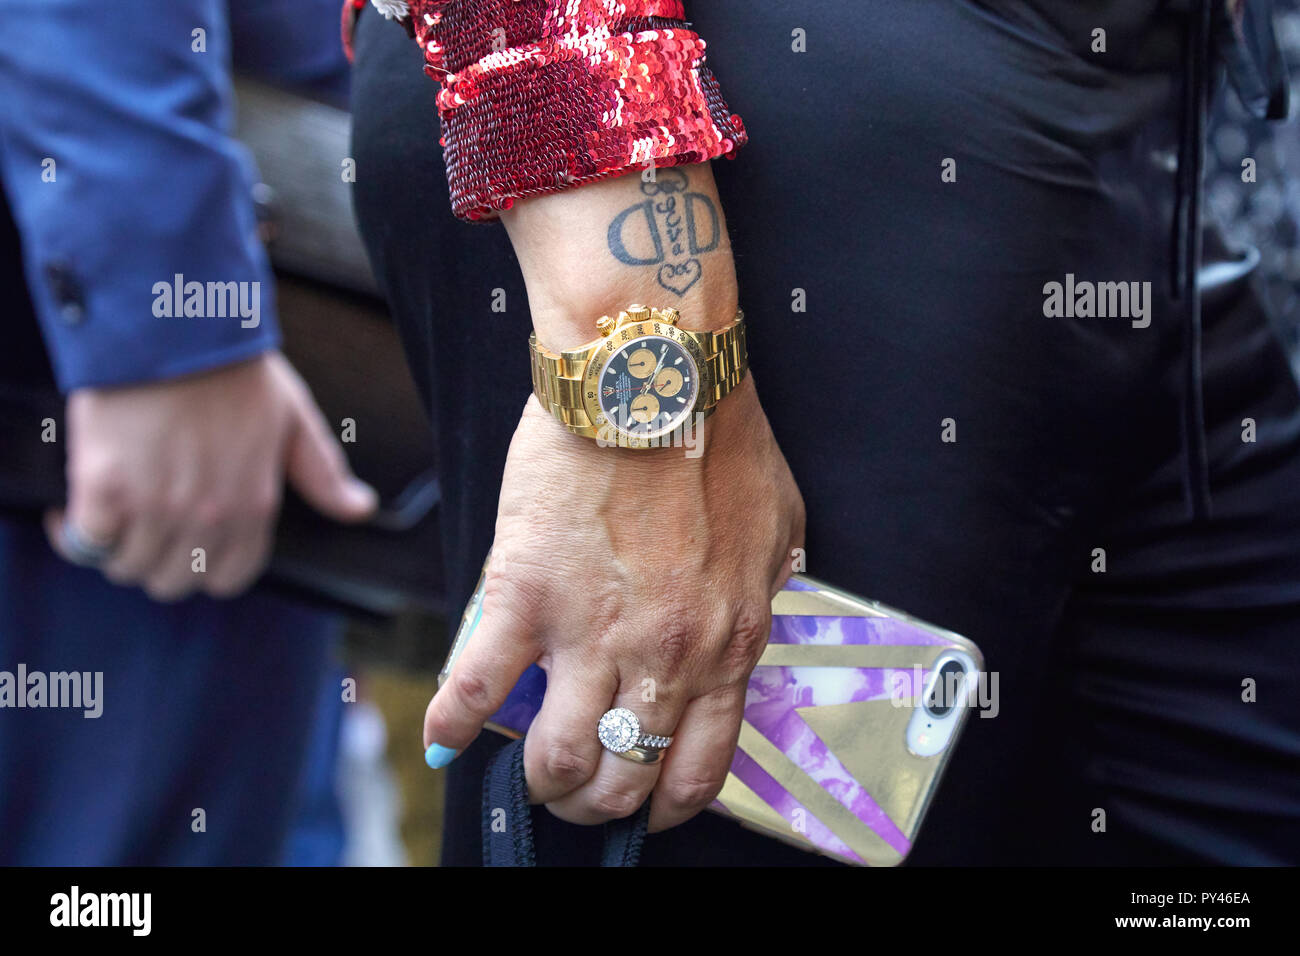 04cb2e64859a6d MILAN, ITALY - SEPTEMBER 23, 2018: Woman with golden Rolex Daytona watch  before Cristiano Burani fashion show, Milan Fashion Week street style